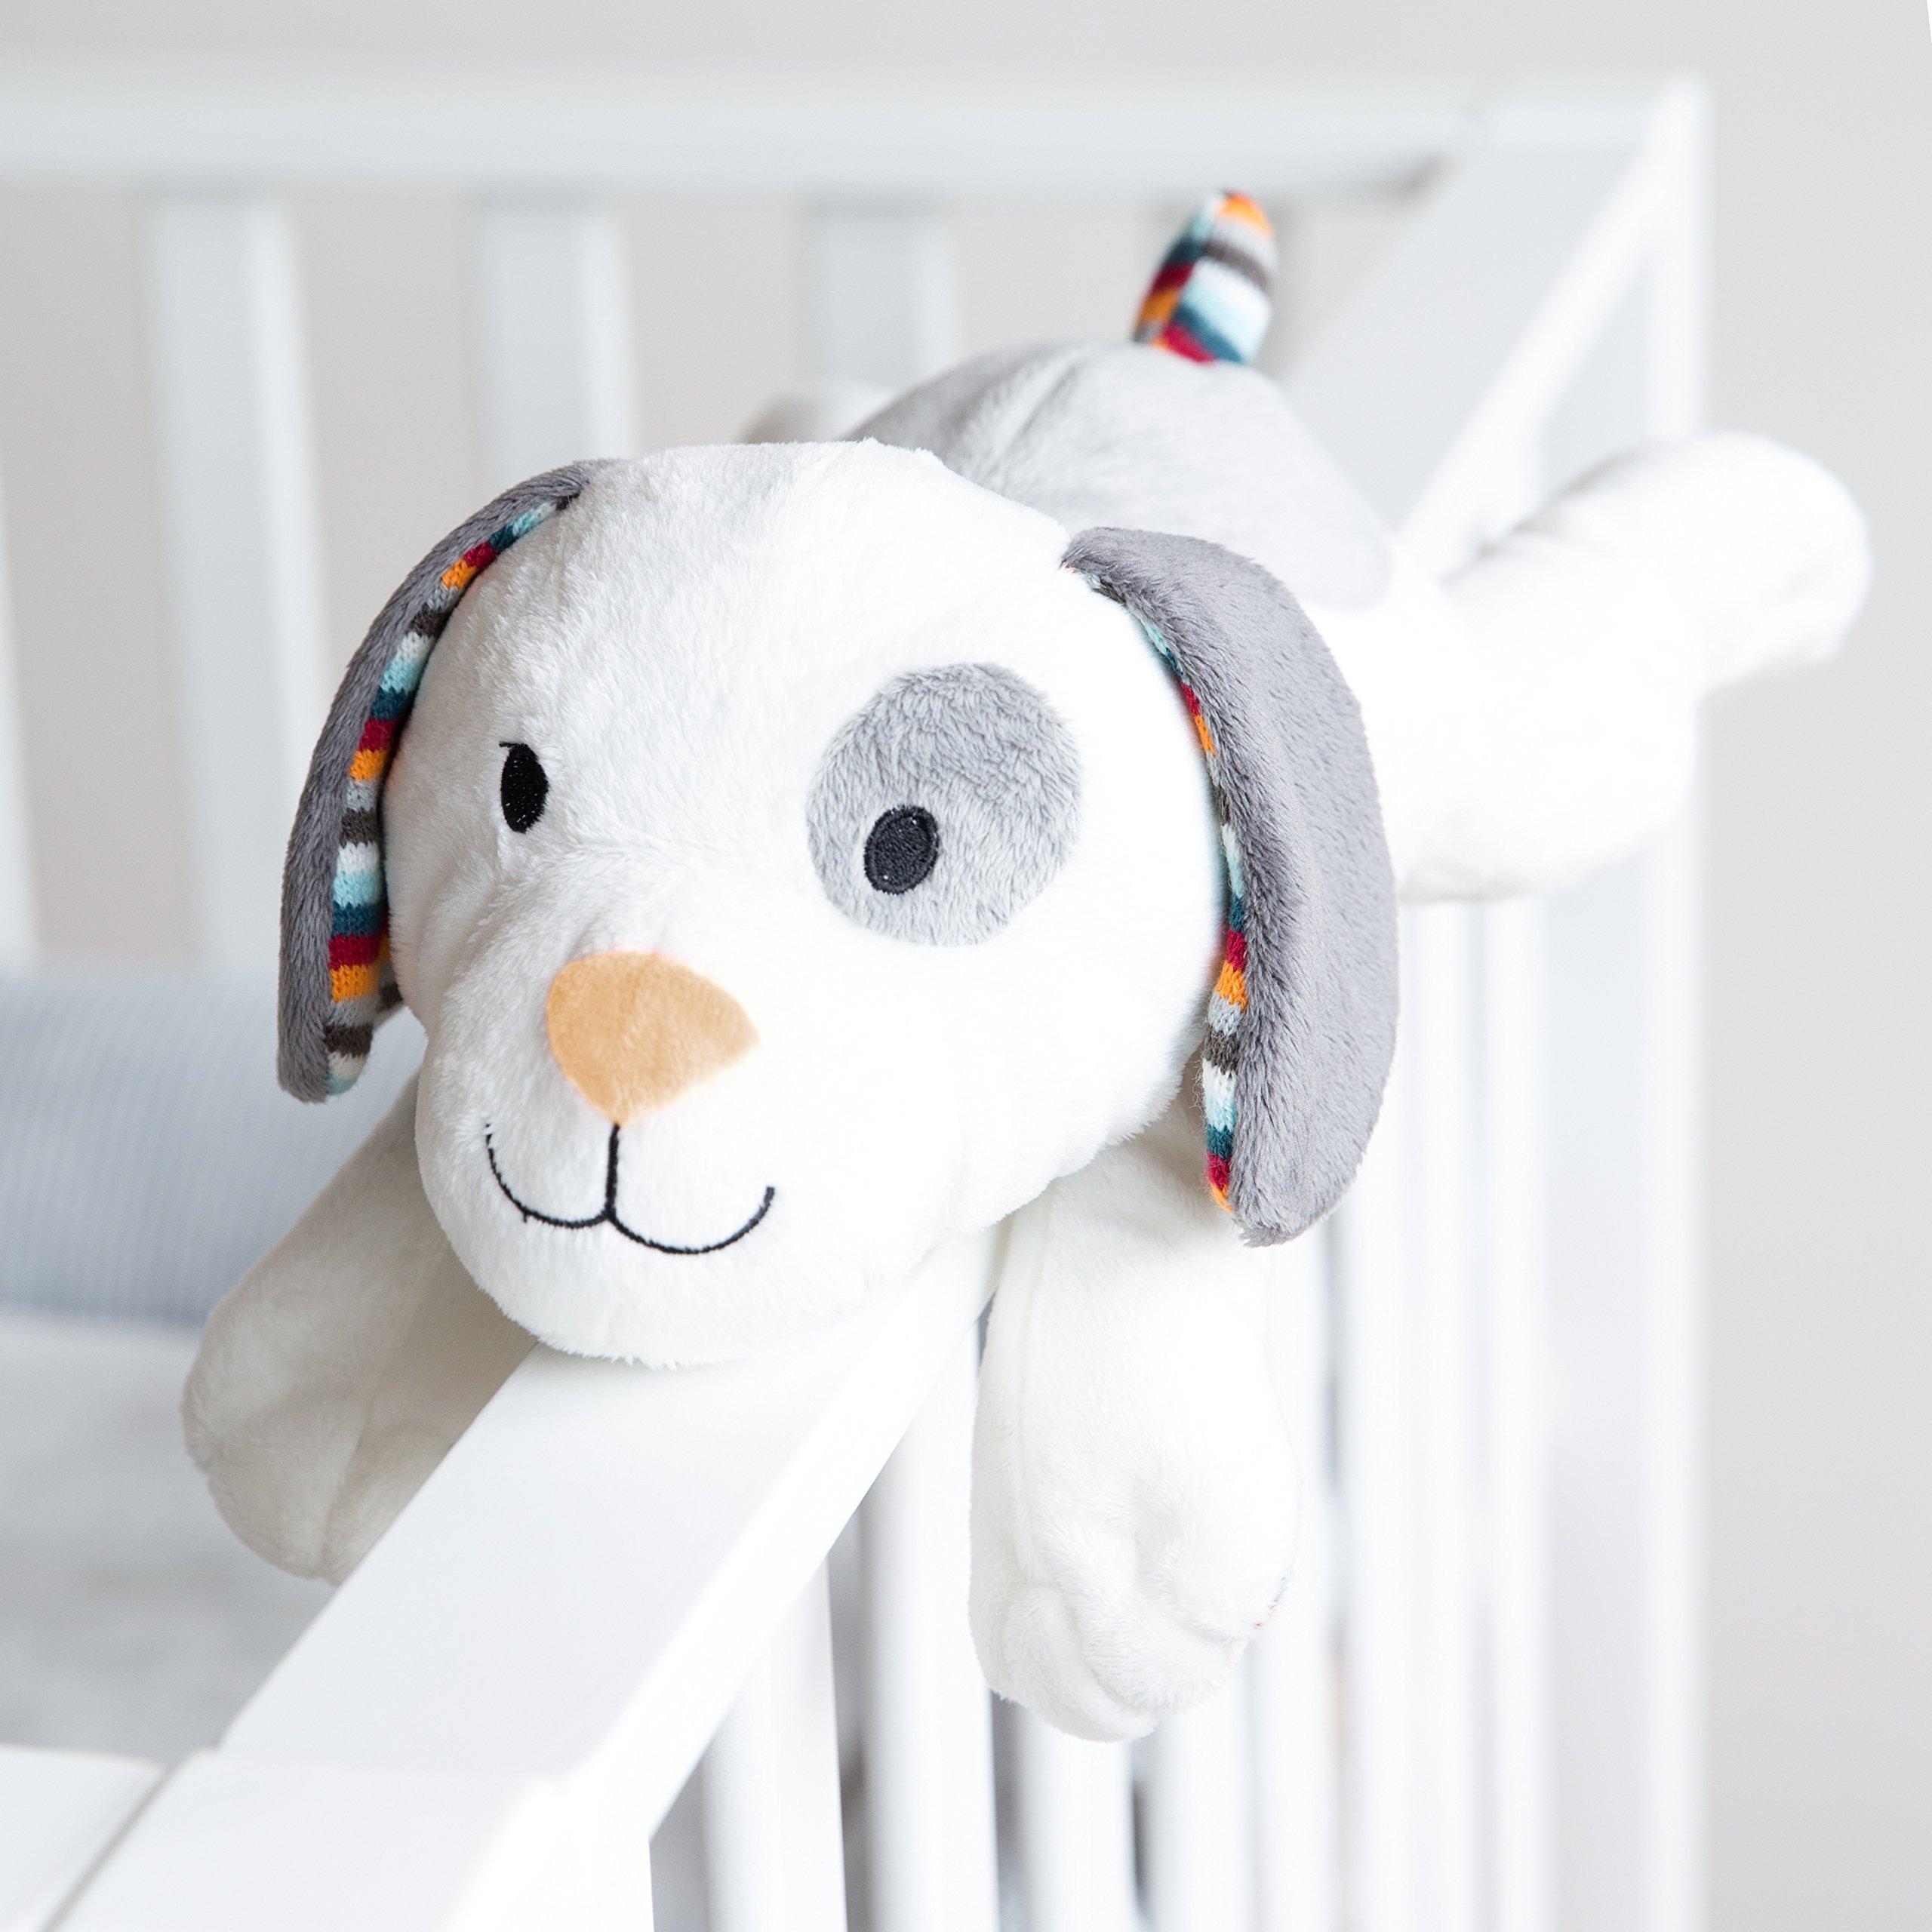 Zazu Kids Soft Heartbeat Toy Voice & Touch Activated Sound Machine Sleep Soother (DEX the Dog), Dog by Zazu Kids